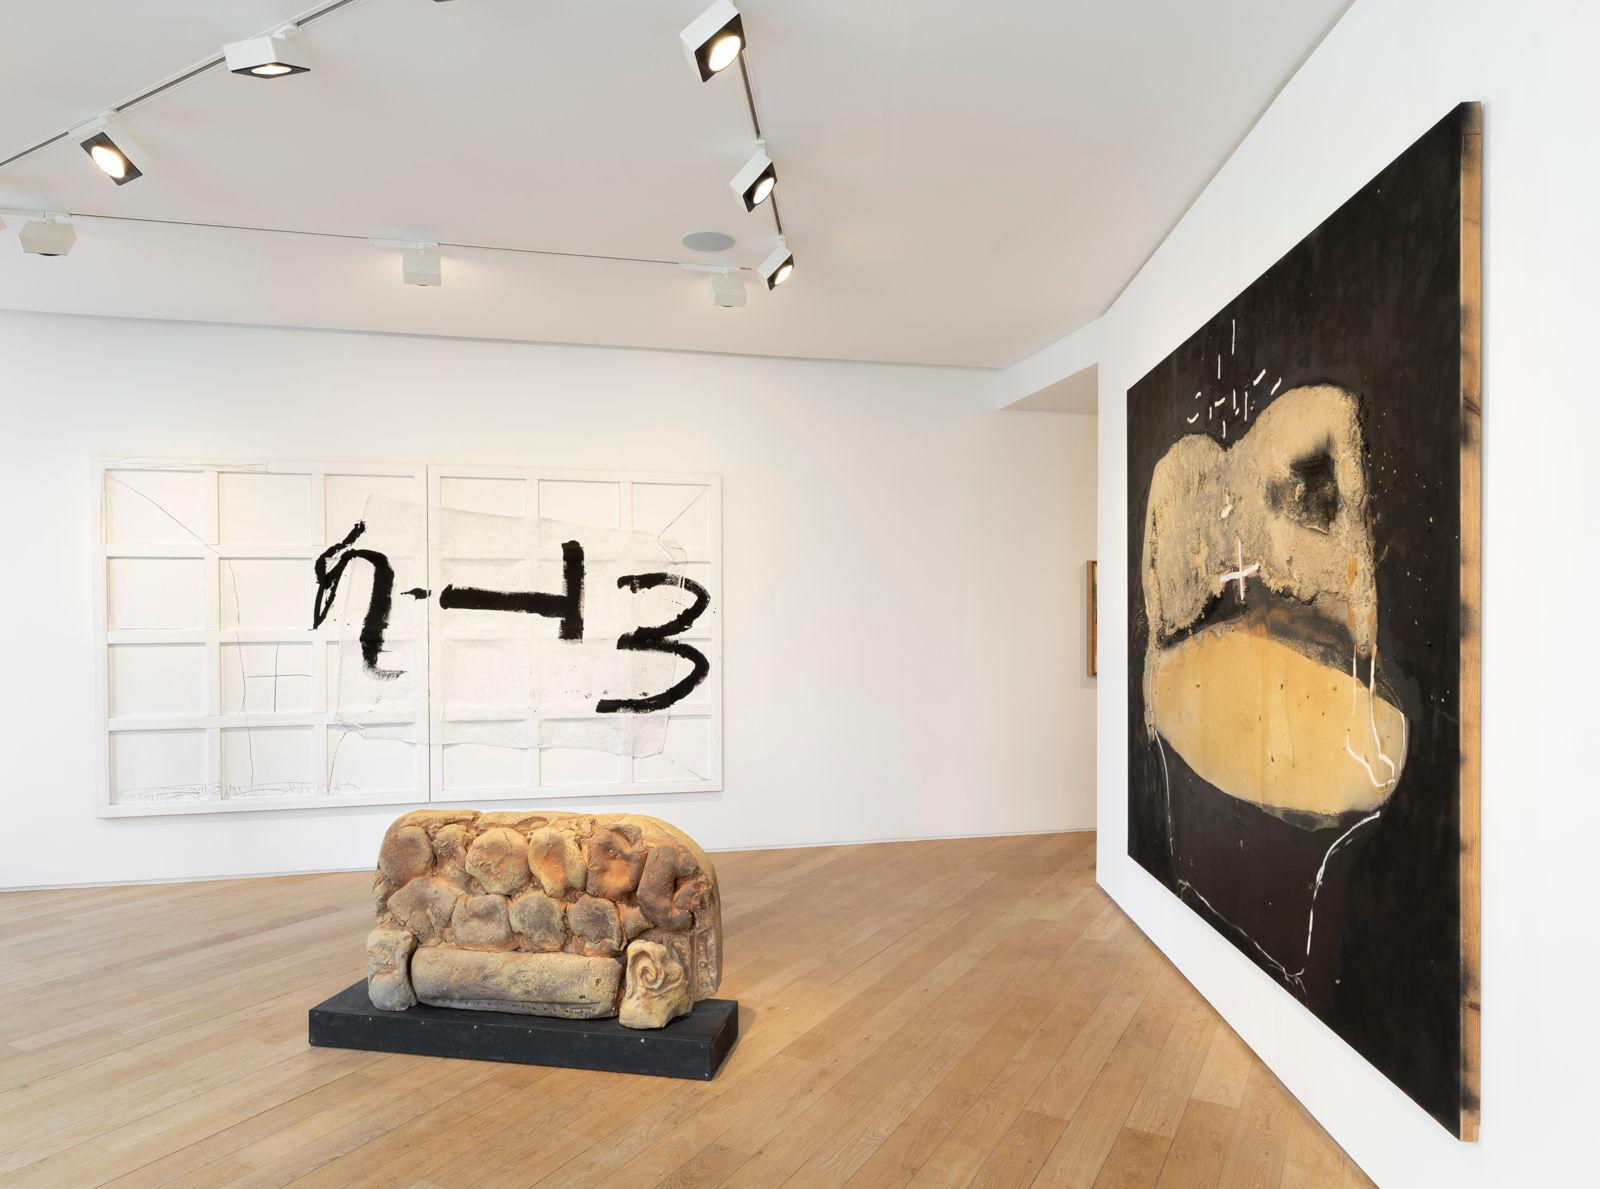 Galerie Lelong avenue Matignon Jannis Kounellis Arnulf Rainer Antoni Tapies 1